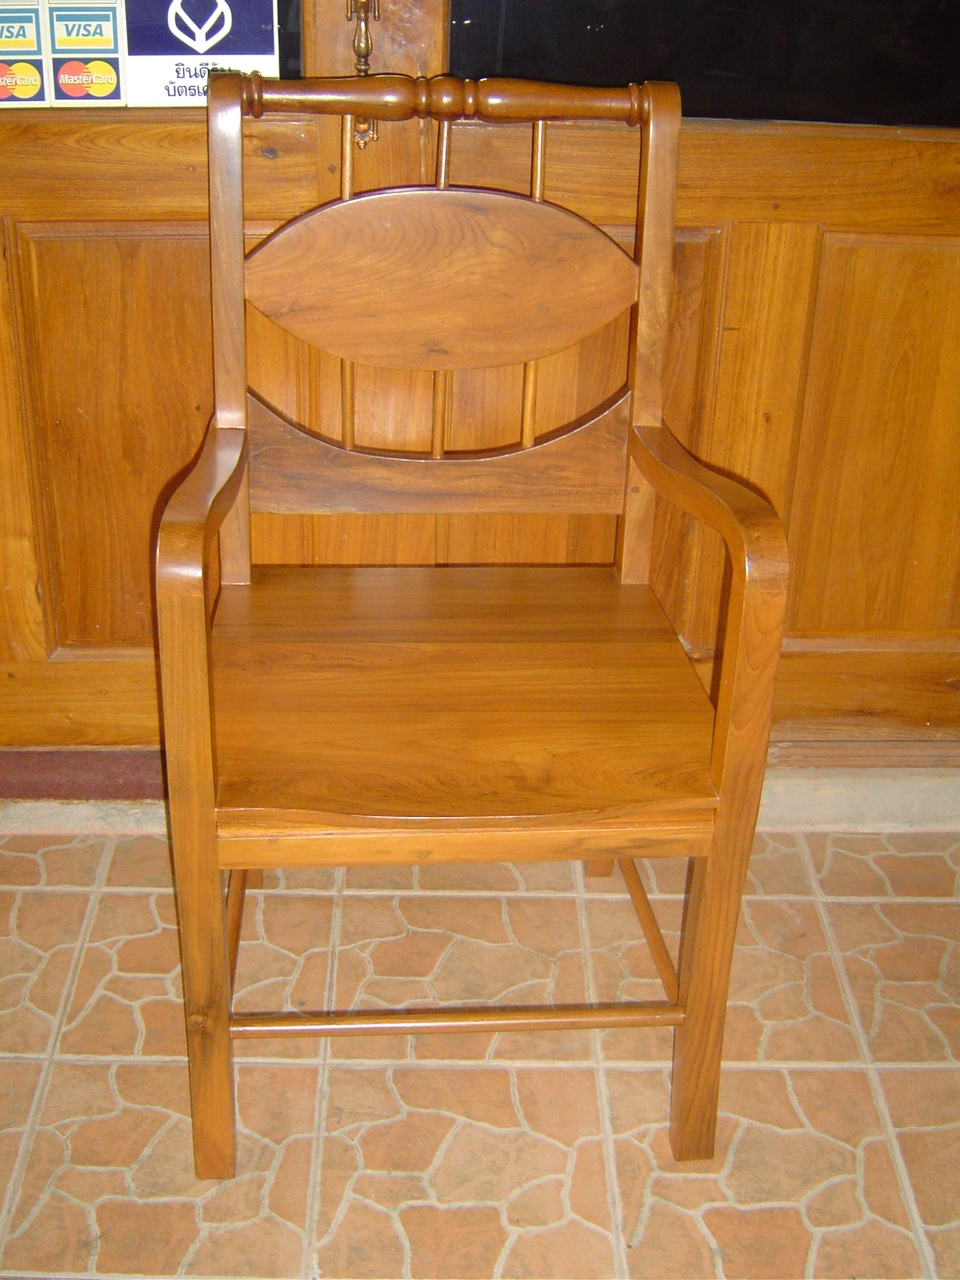 Antique Chair-sn002-1